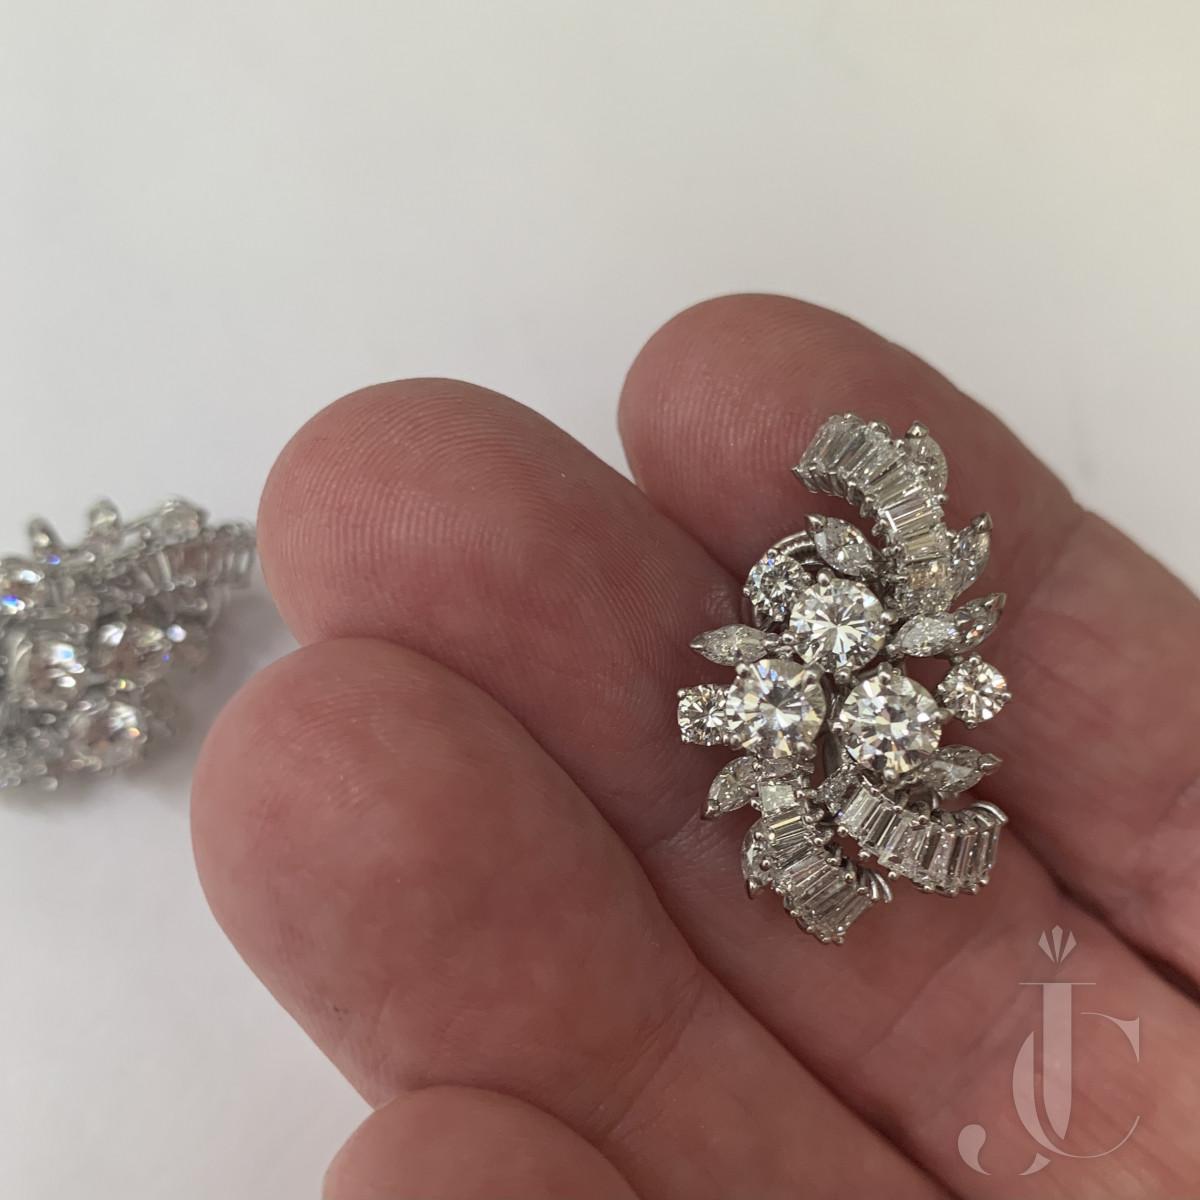 Bvlgari Diamond Earrings